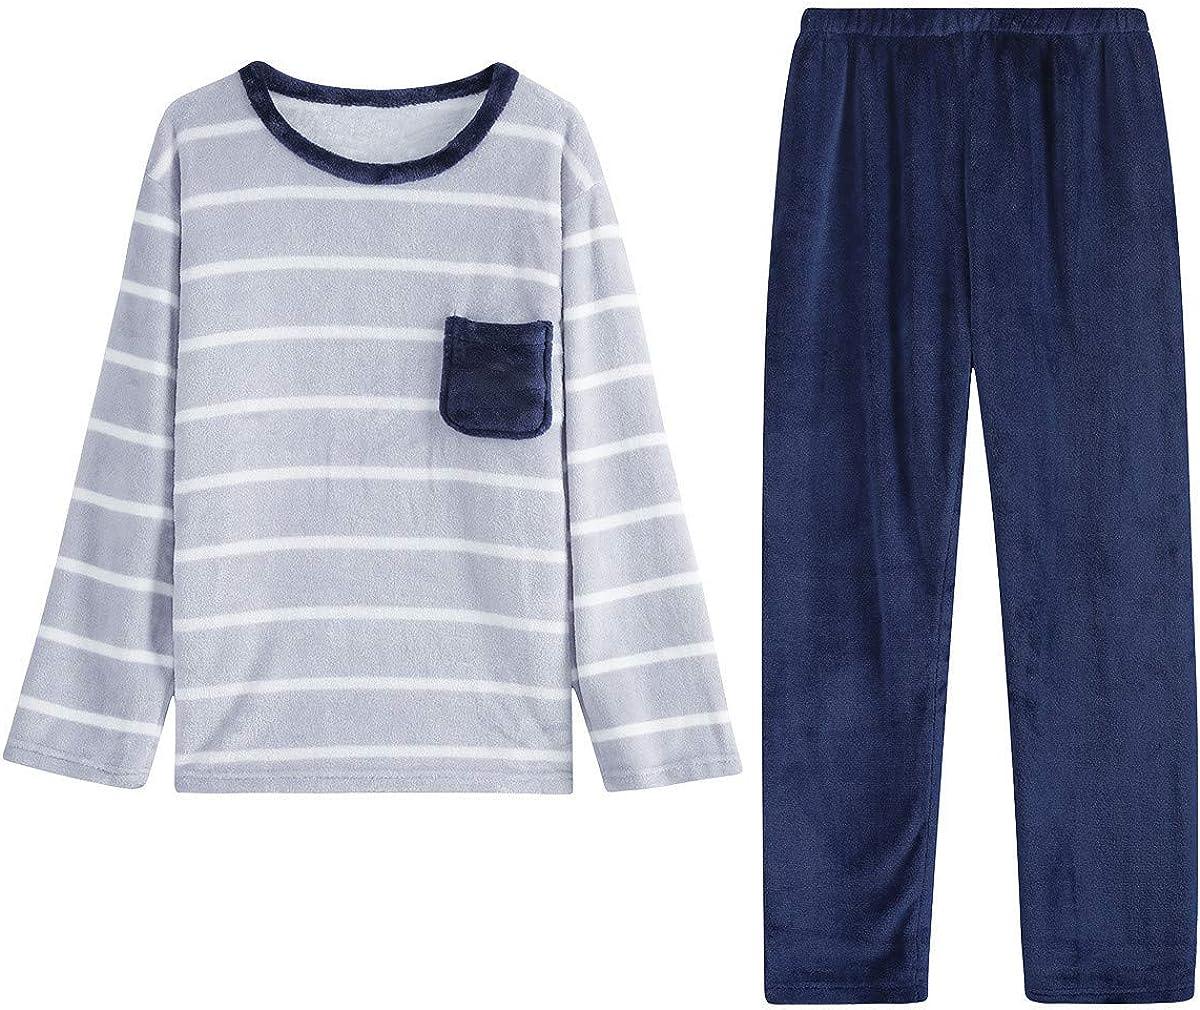 Amazon.com: TOP-MAX Young Mens Pajamas Set for Big Boys Warm Winter Fleece Pajamas  Set for Teens Boys Long Sleeve Sleepwear: Clothing